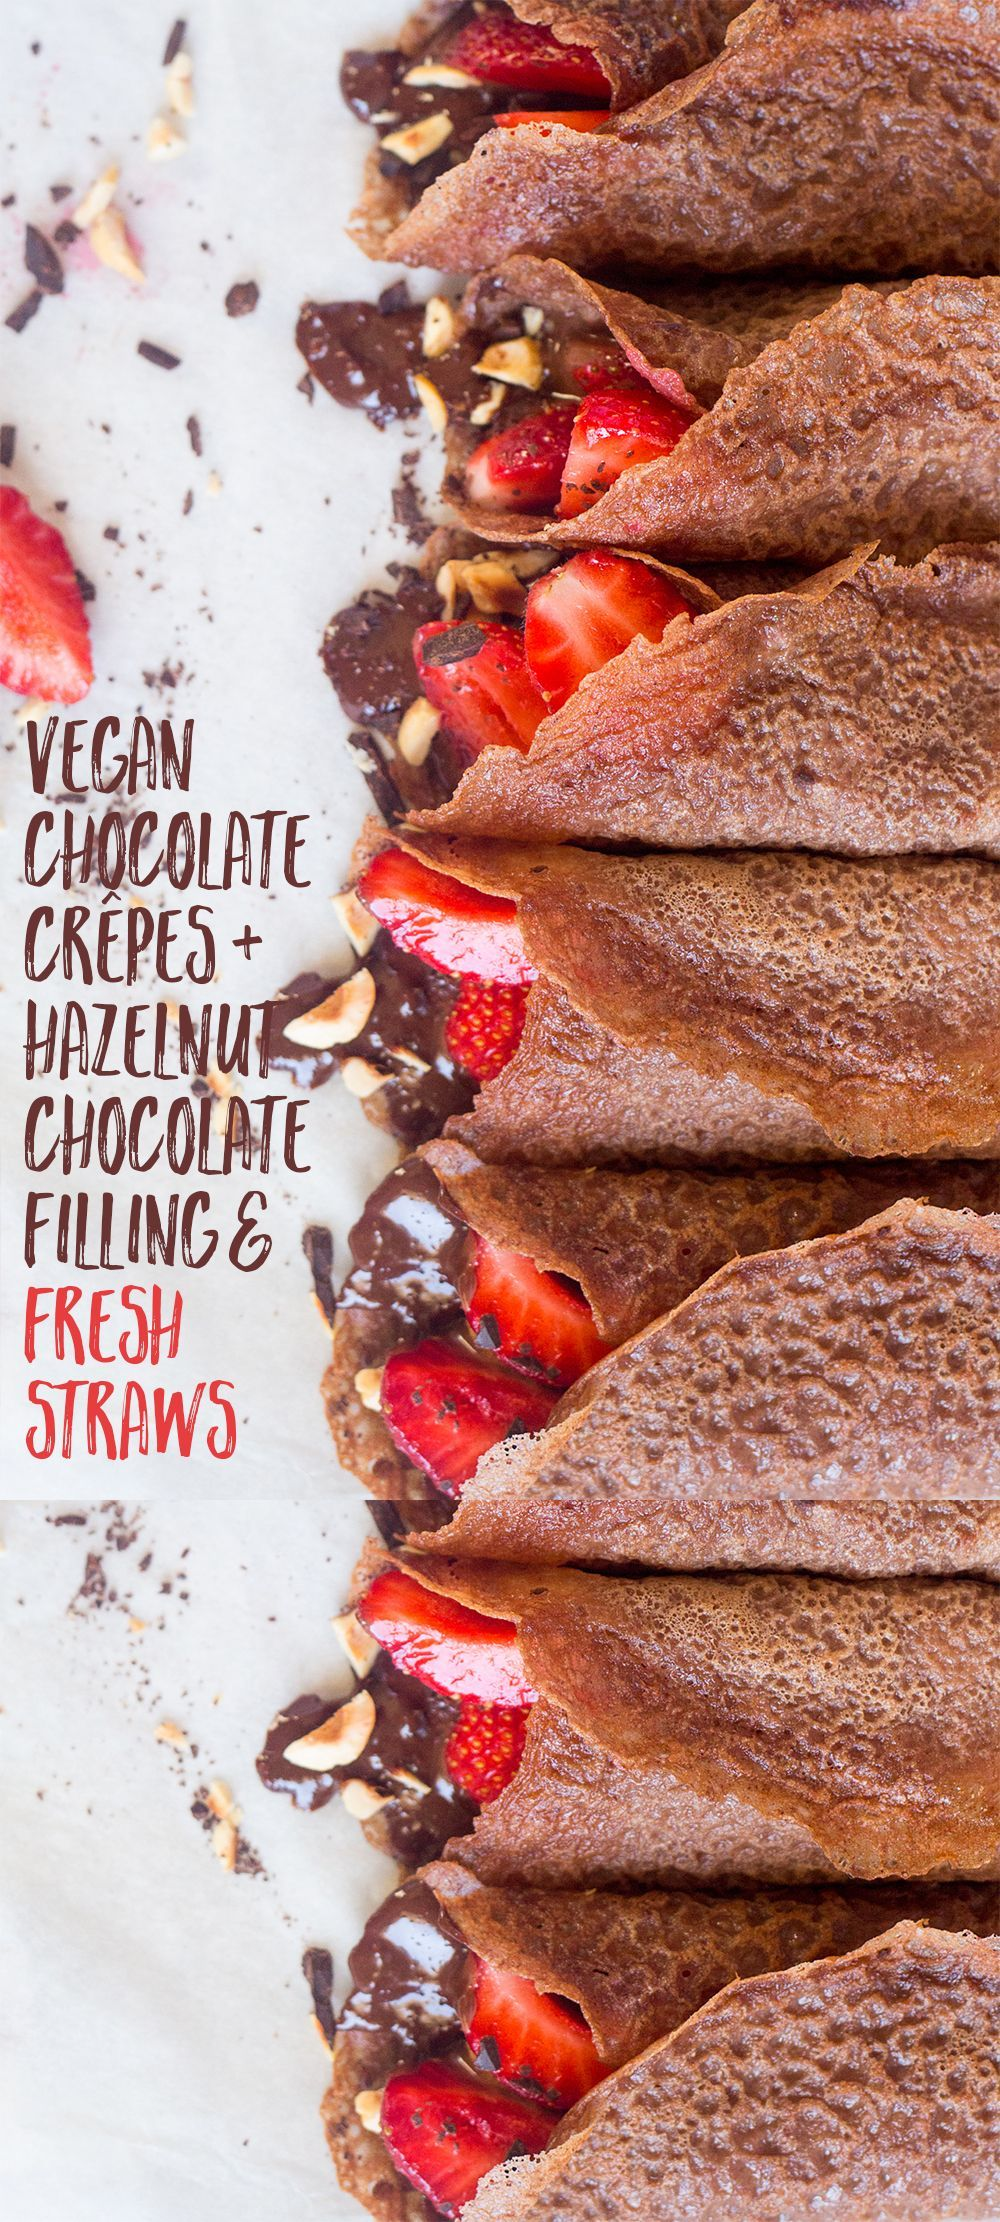 Vegan Chocolate Crêpes with Hazelnut Chocolate Filling and Fresh Strawberries  |  Lazy Cat Kitchen  |  V